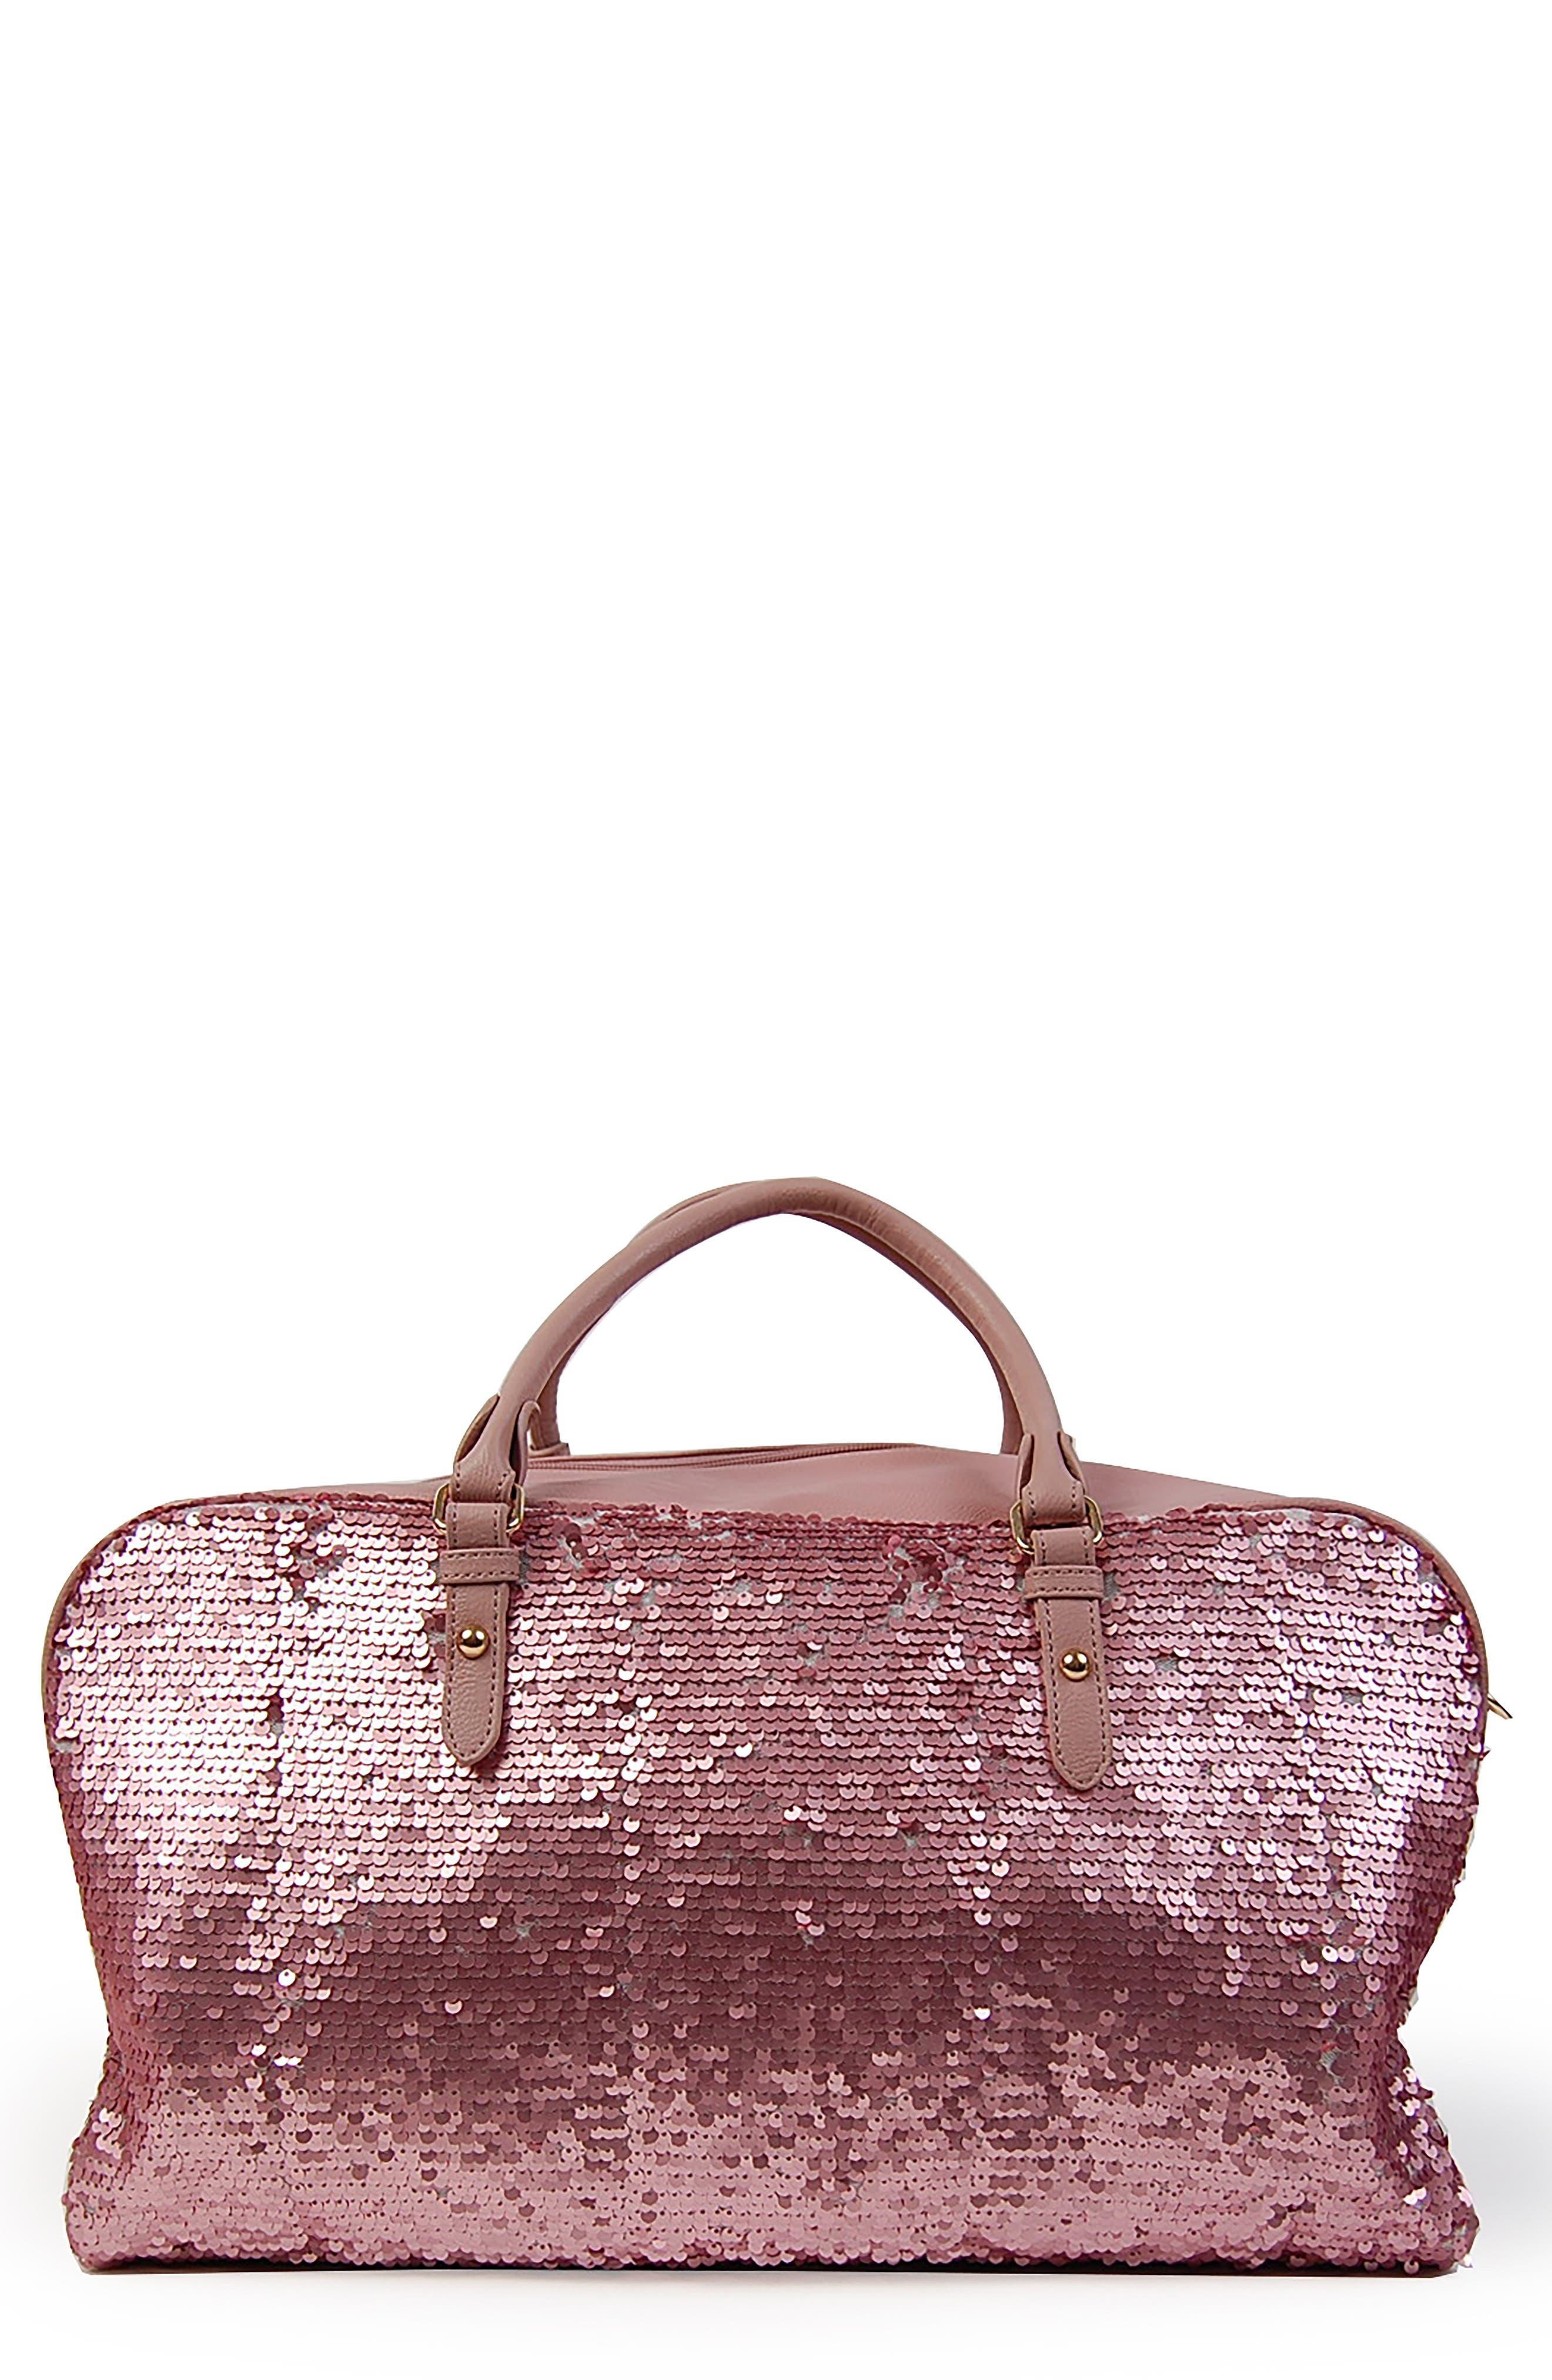 Sequin Duffel Bag,                             Main thumbnail 1, color,                             MAUVE